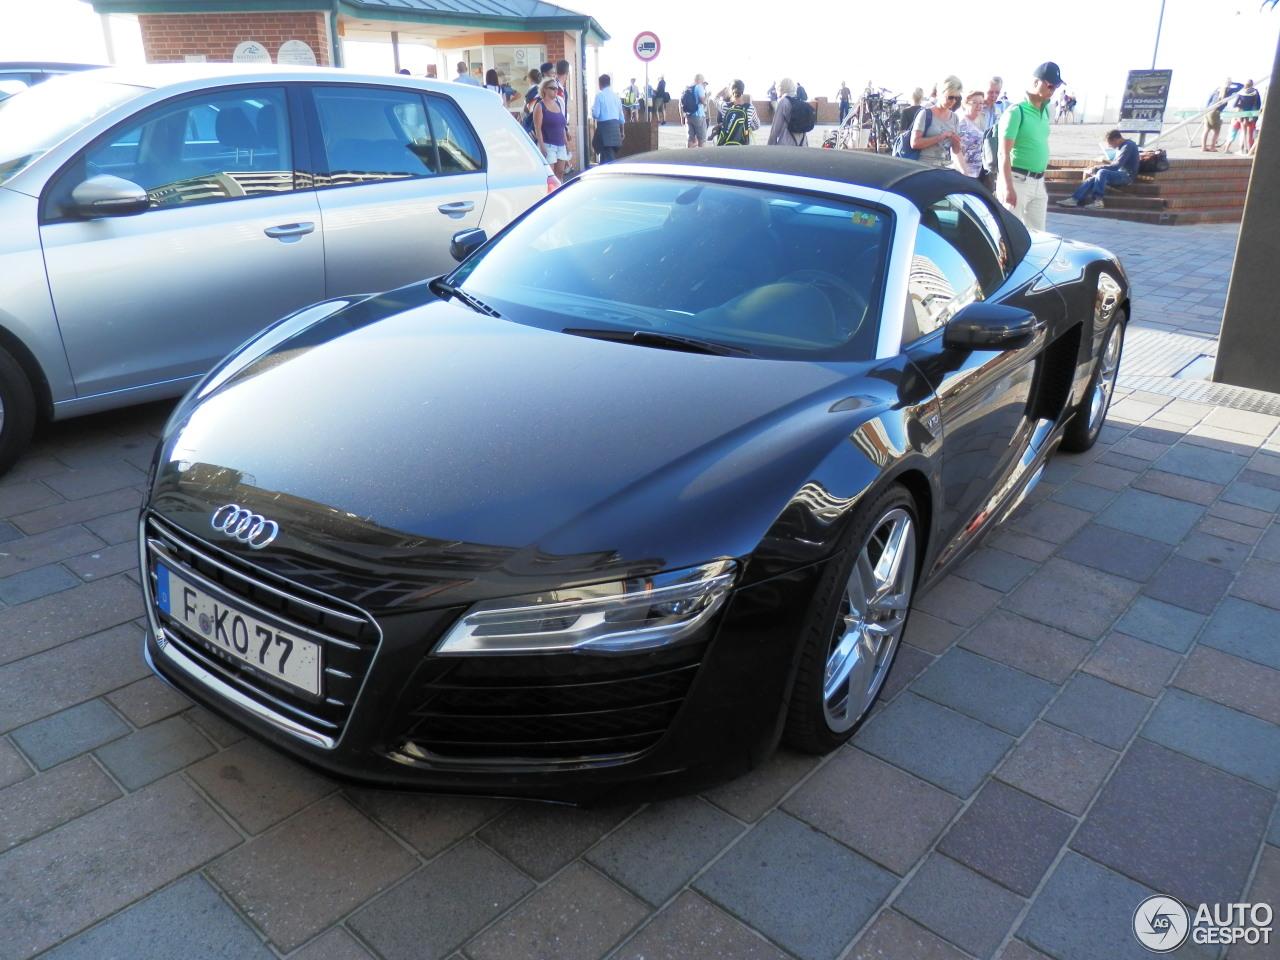 Audi R8 V10 Spyder 2013 1